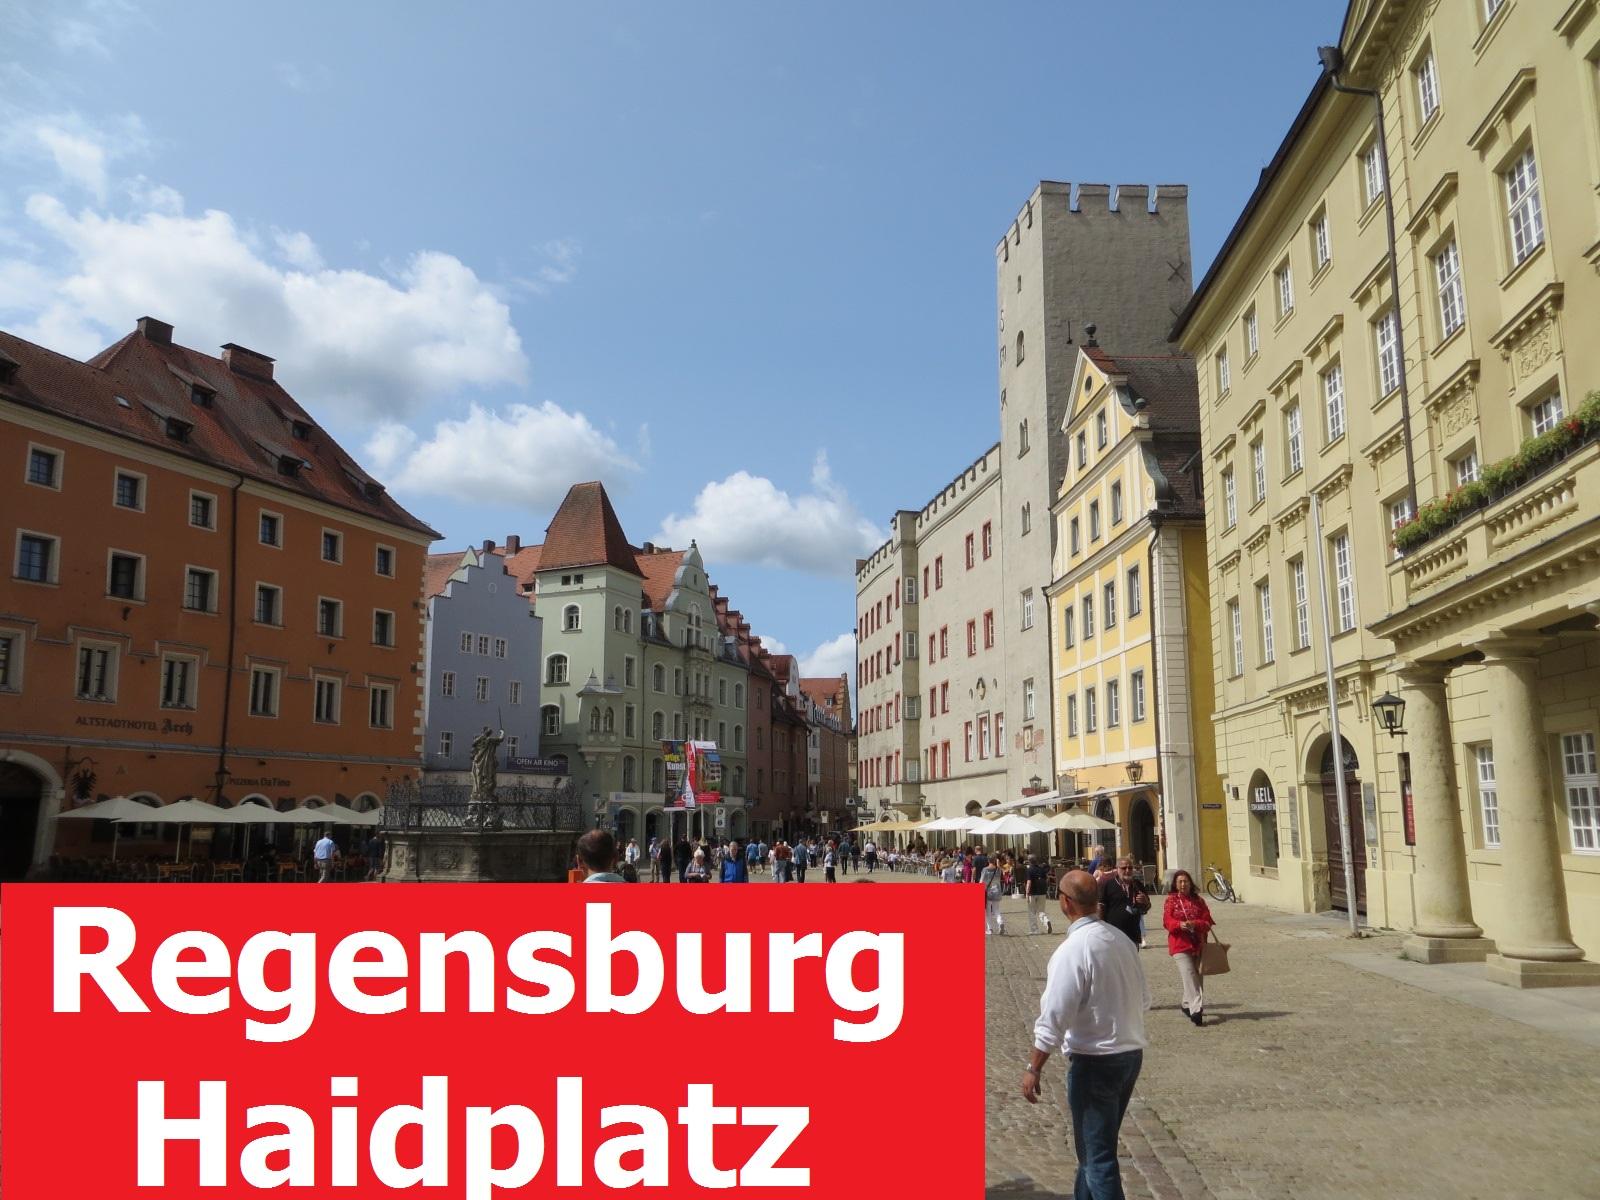 Регенсбург. Площадь Хайдплатц - Haidplatz. Аудиогид на немецком языке